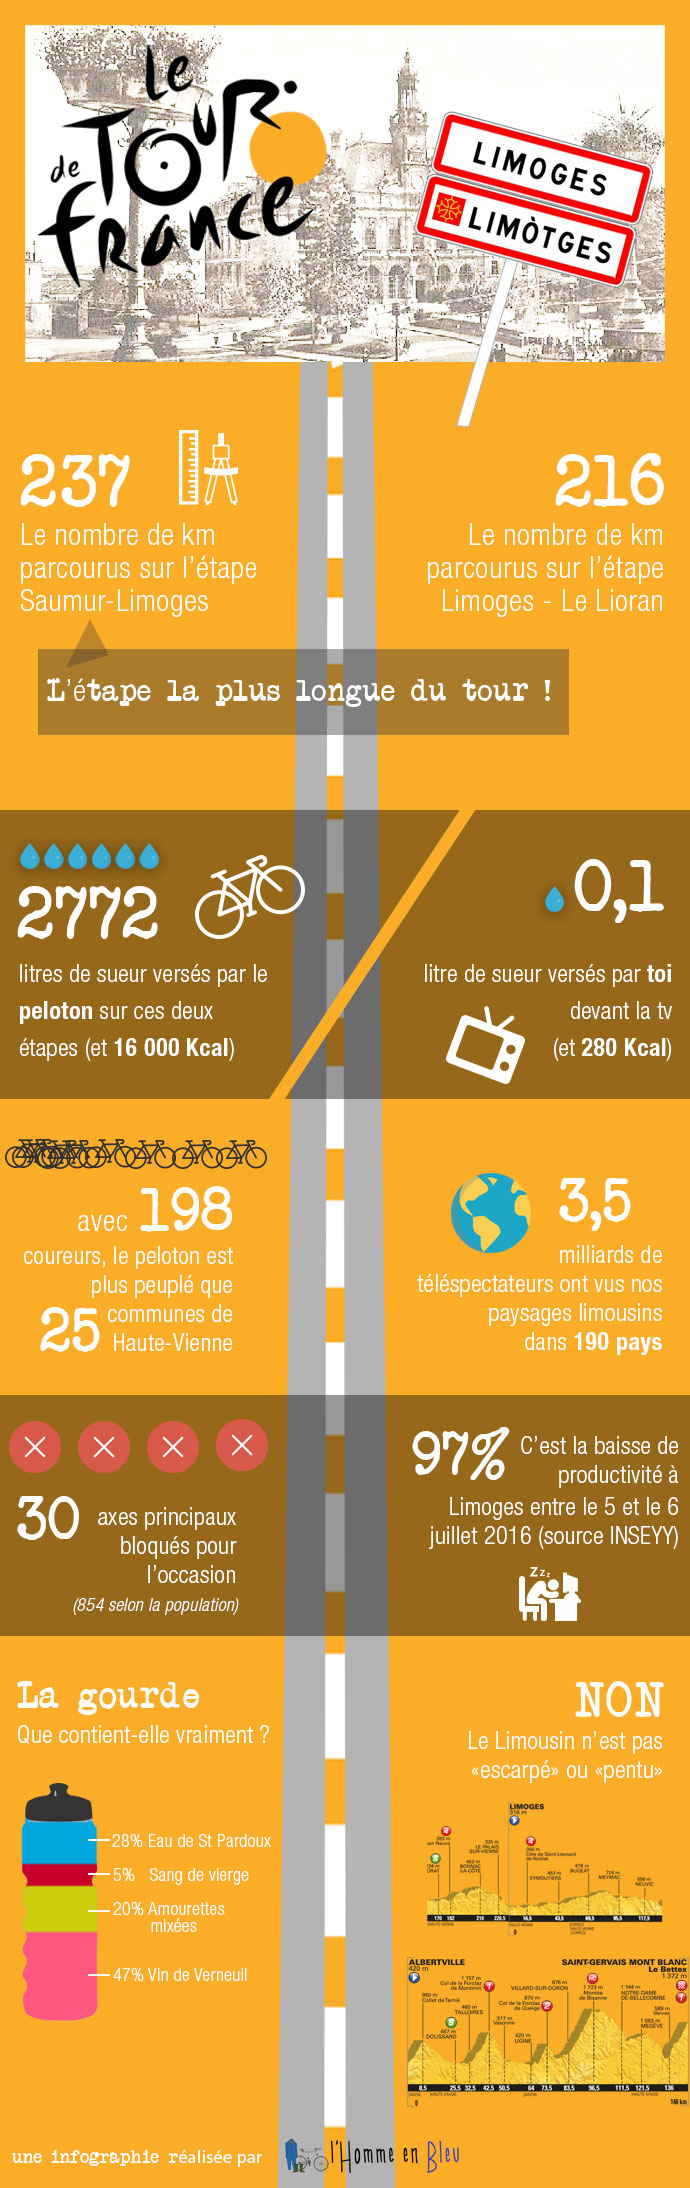 infographie-tour-france-limoges